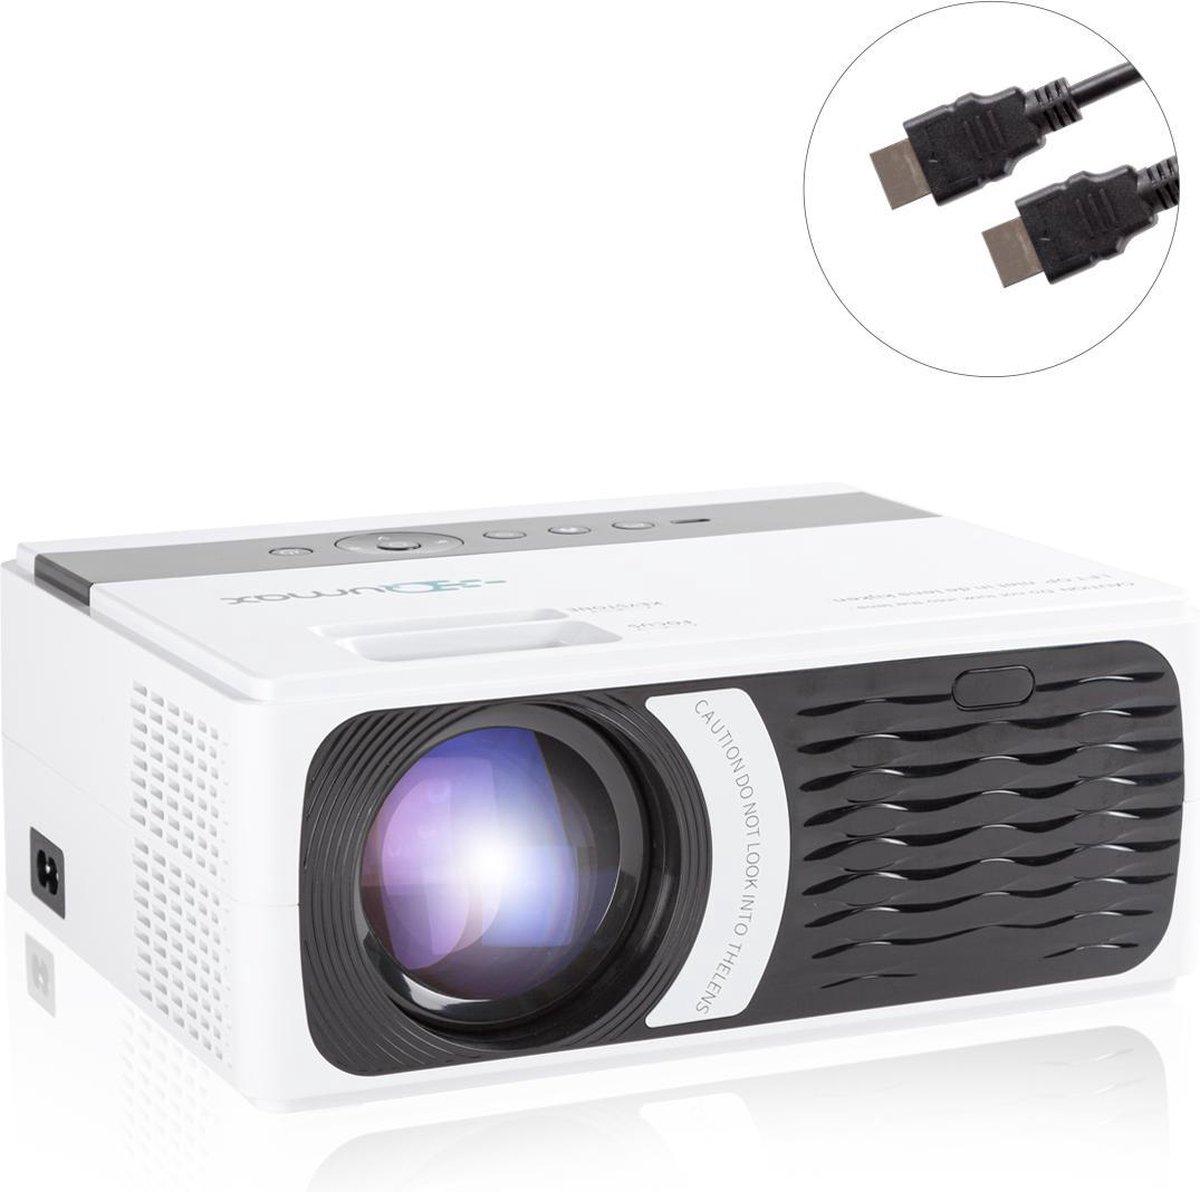 Qumax Pro Mini Beamer met HDMI kabel - Projector Beamer - 4000 lumen